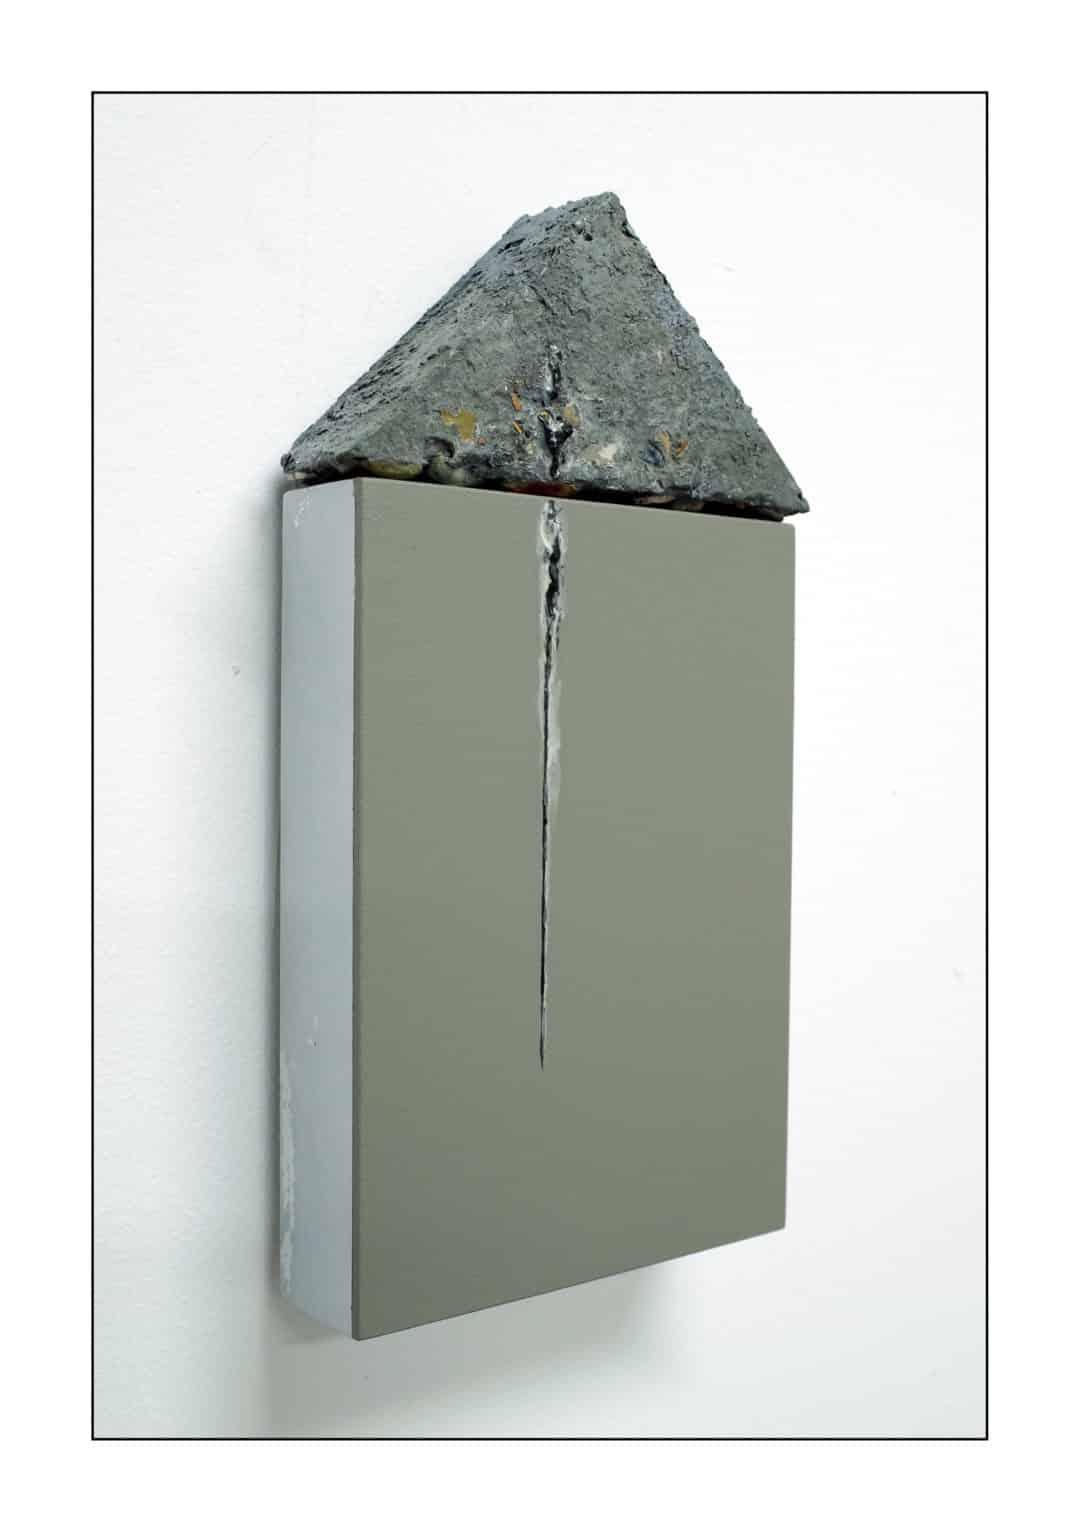 PORTICO (The Grey Brown Natural Umber. Aesthetic, Balanced, Elegant).